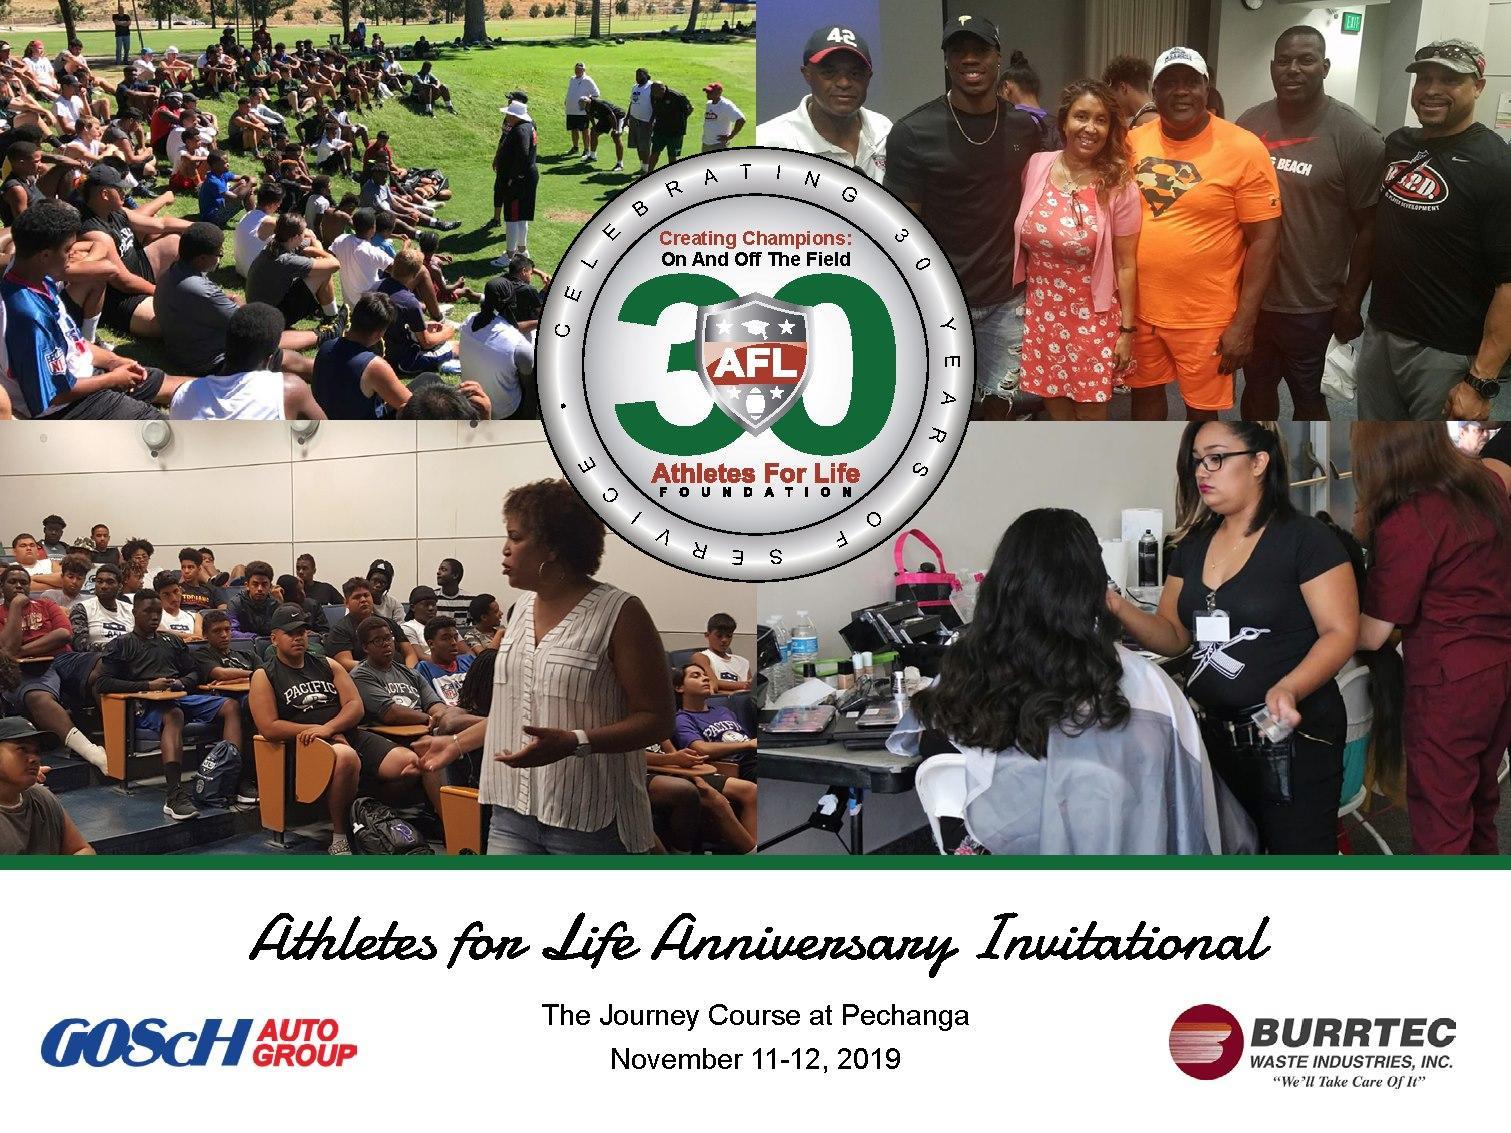 Athletes for Life Anniversary Golfing Invitational